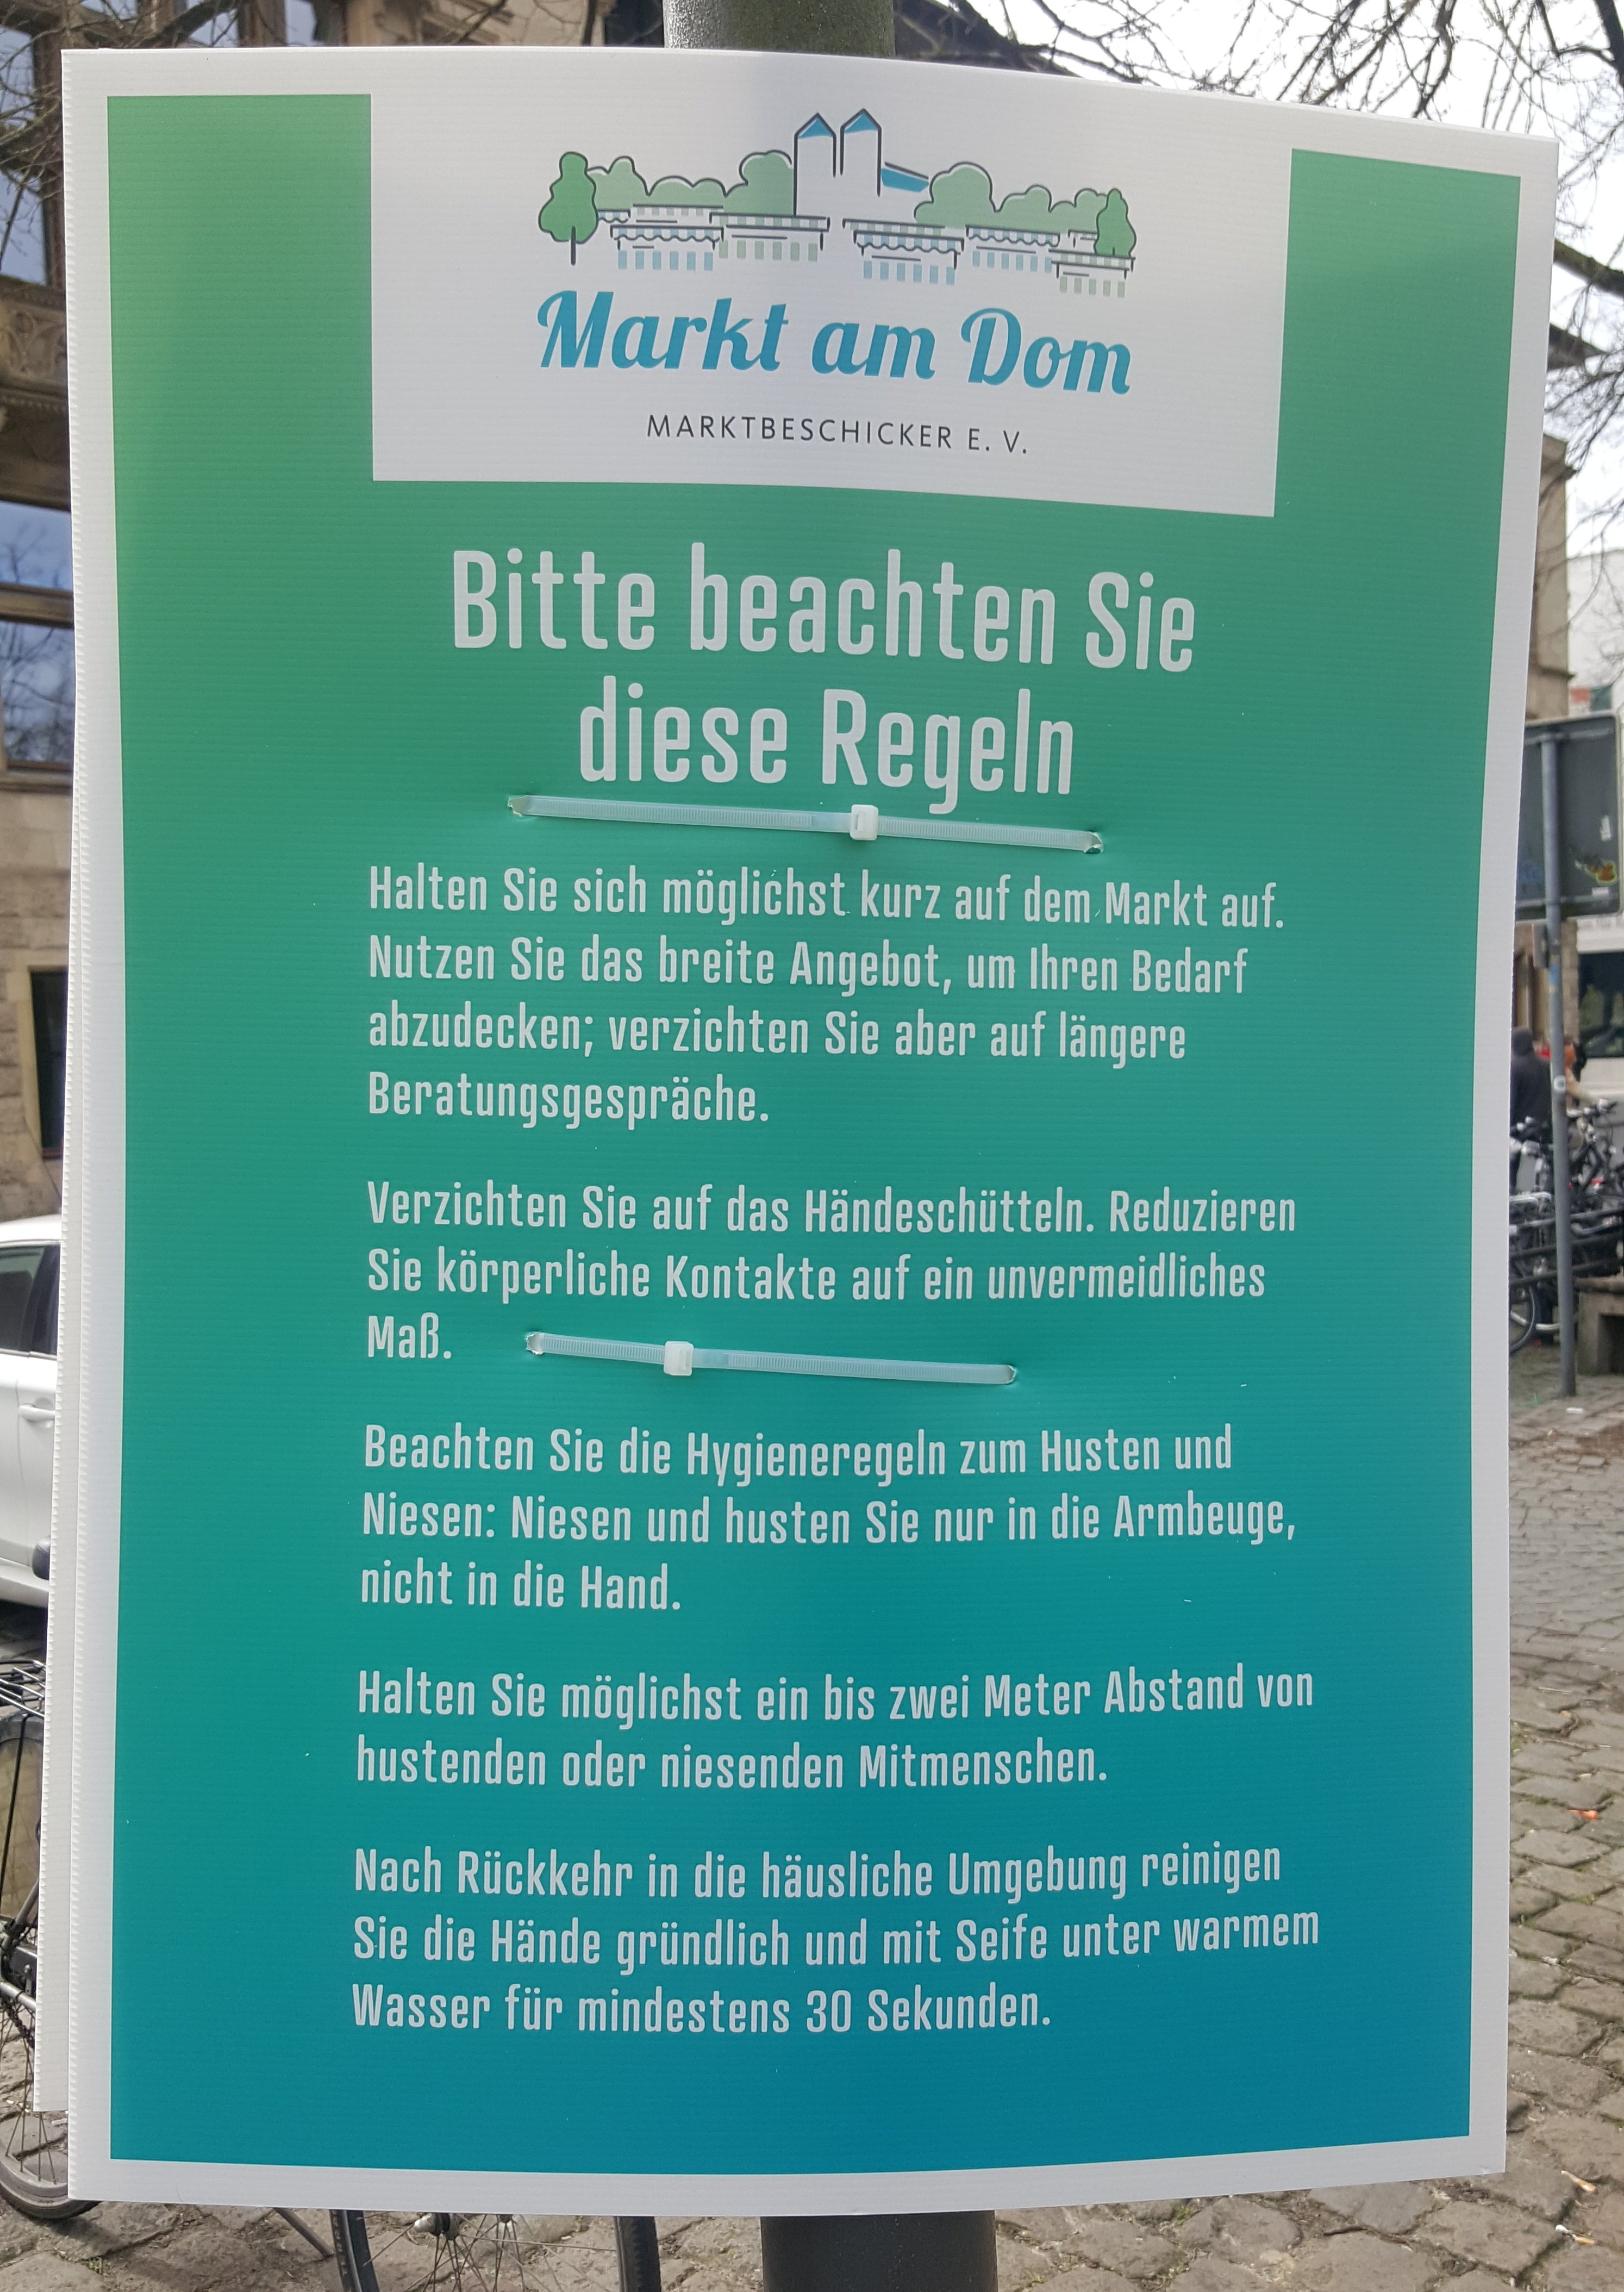 Die Besucher werden mit klaren Verhaltensregeln empfangen - Foto: Jörg Bockow